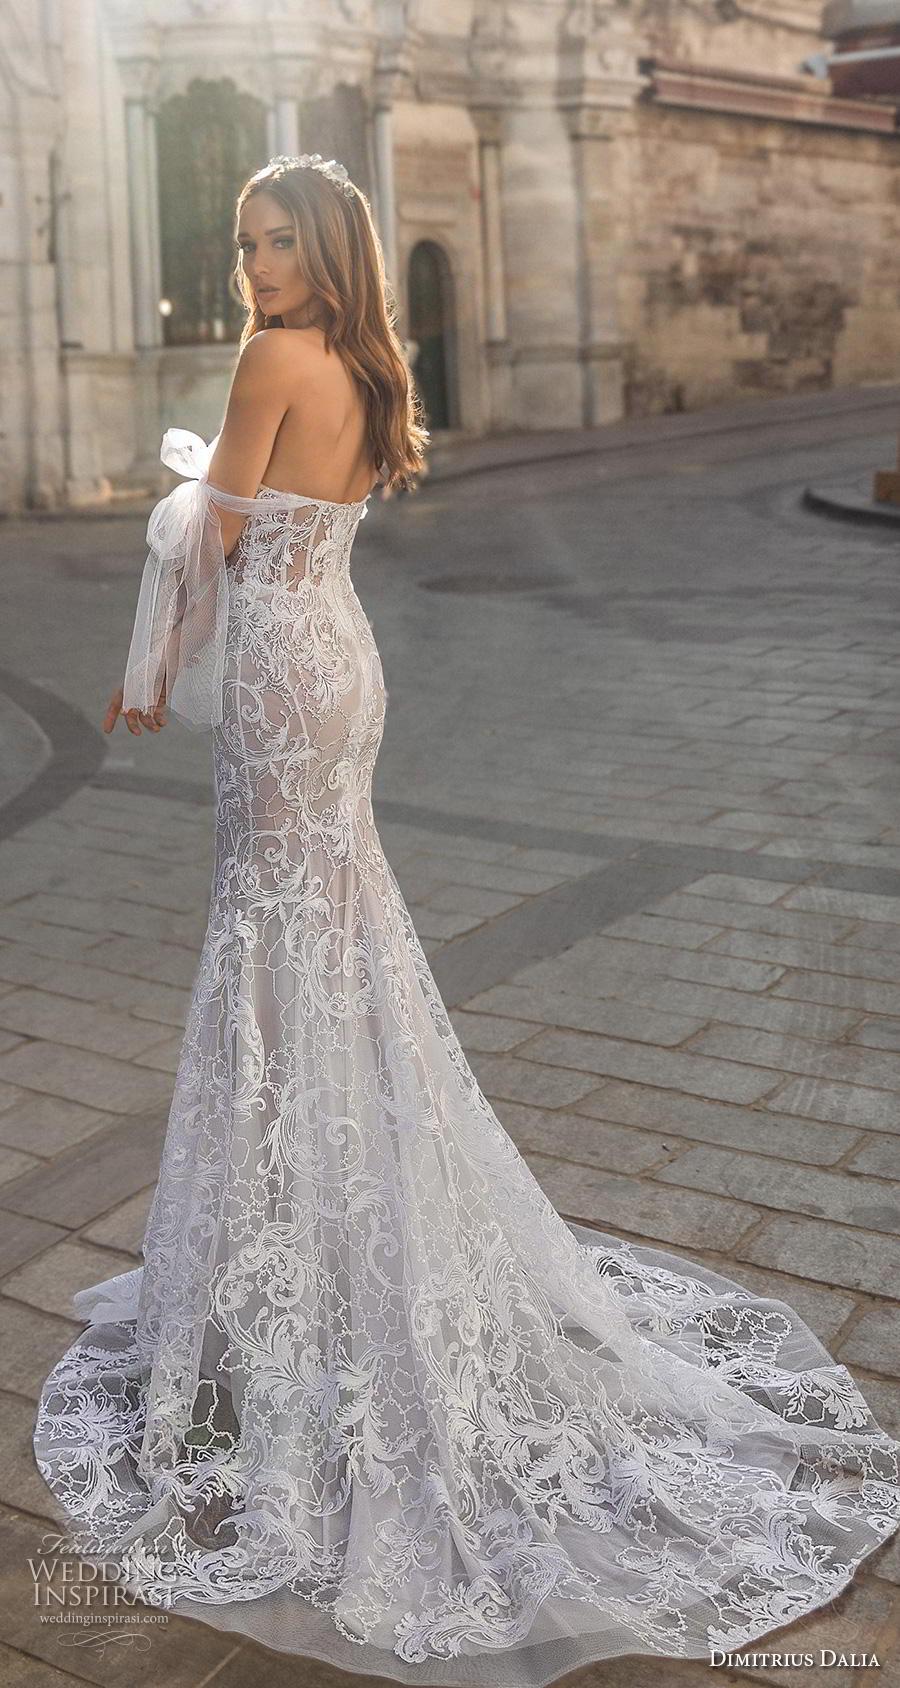 dimitrius dalia 2019 bridal off the shoulder sweetheart neckline full embellishment bustier elegant fit and flare wedding dress  mid back medium train (3) bv